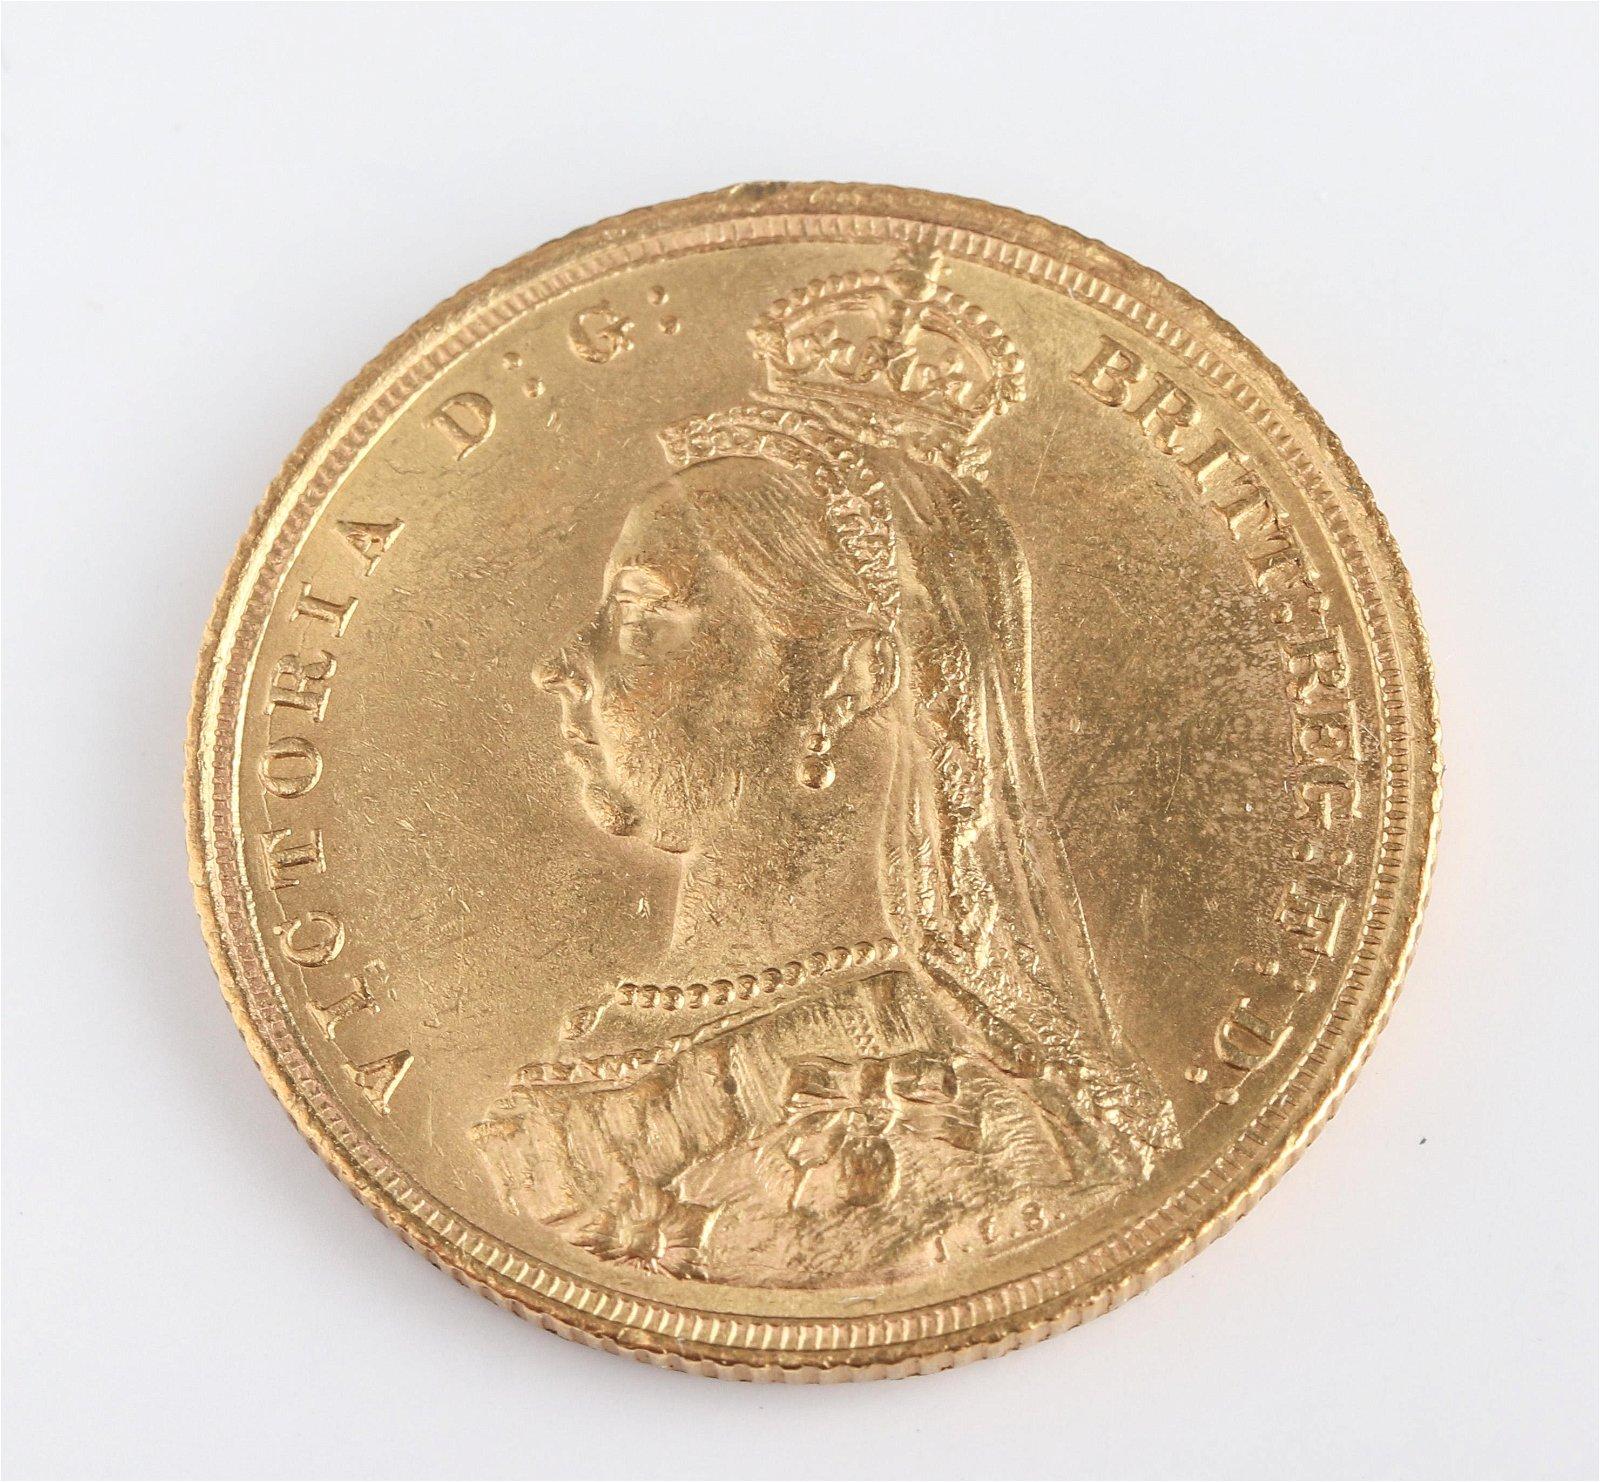 1889 S Australia Victoria Sovereign Gold Coin